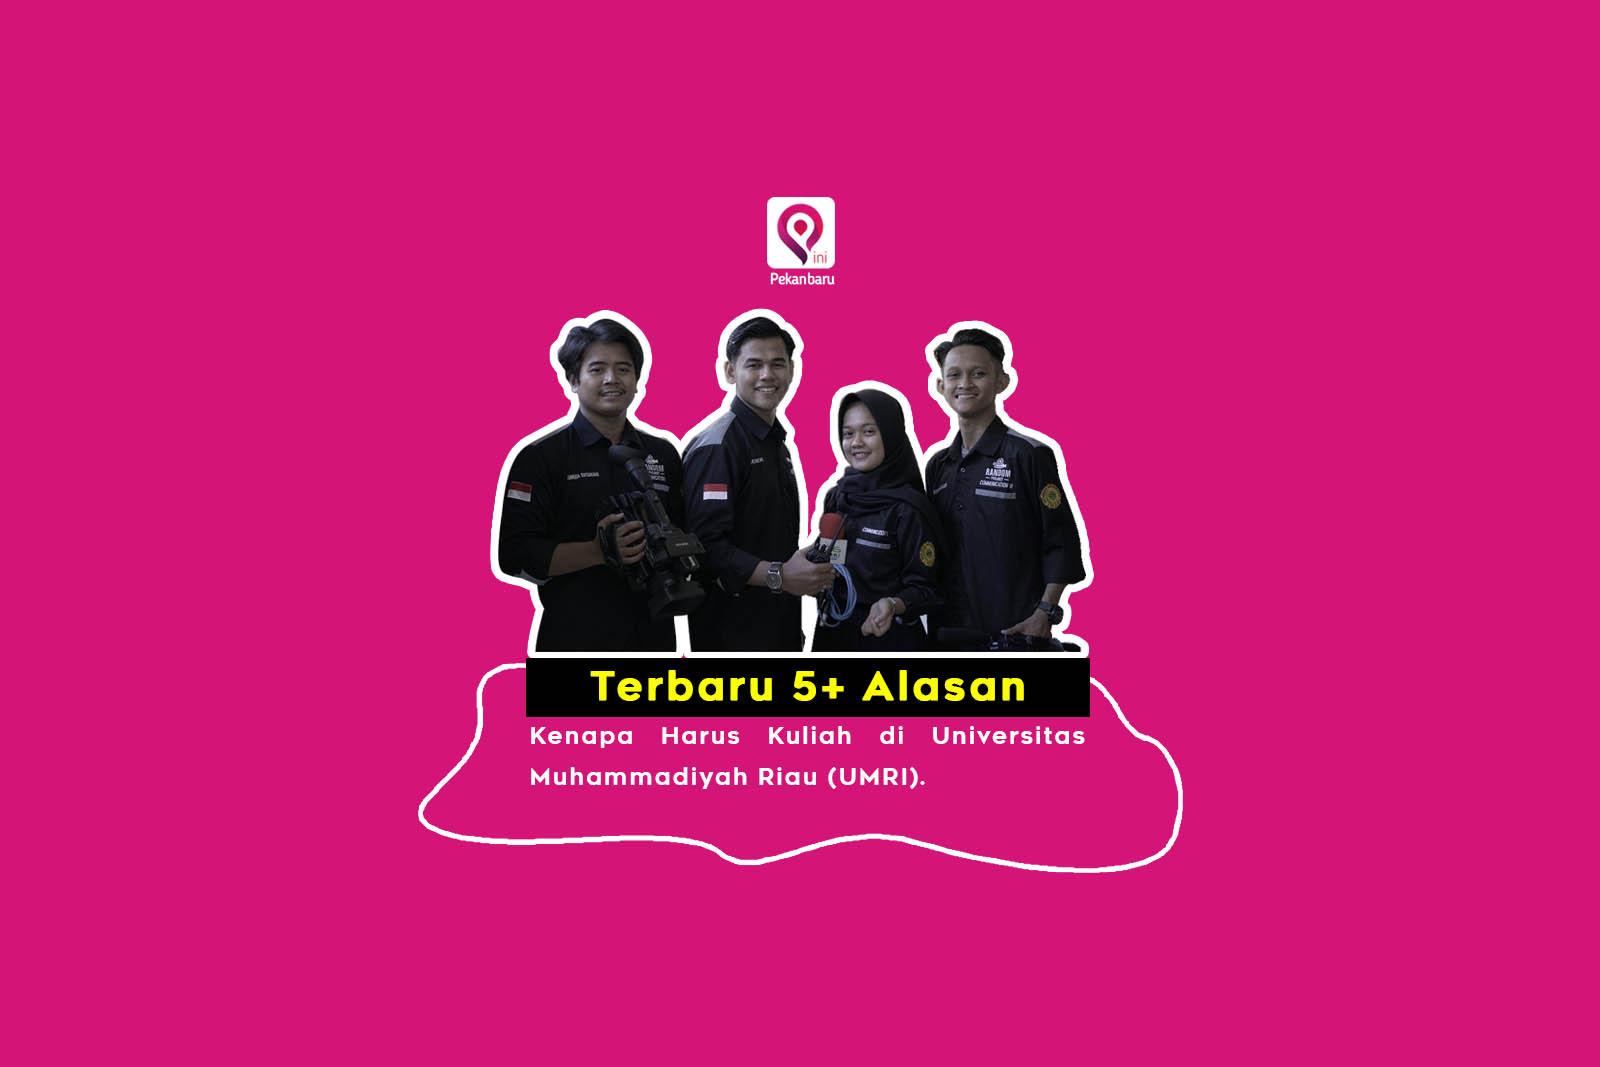 Terbaru 5+ Alasan Kenapa Harus Kuliah di Universitas Muhammadiyah Riau (UMRI)